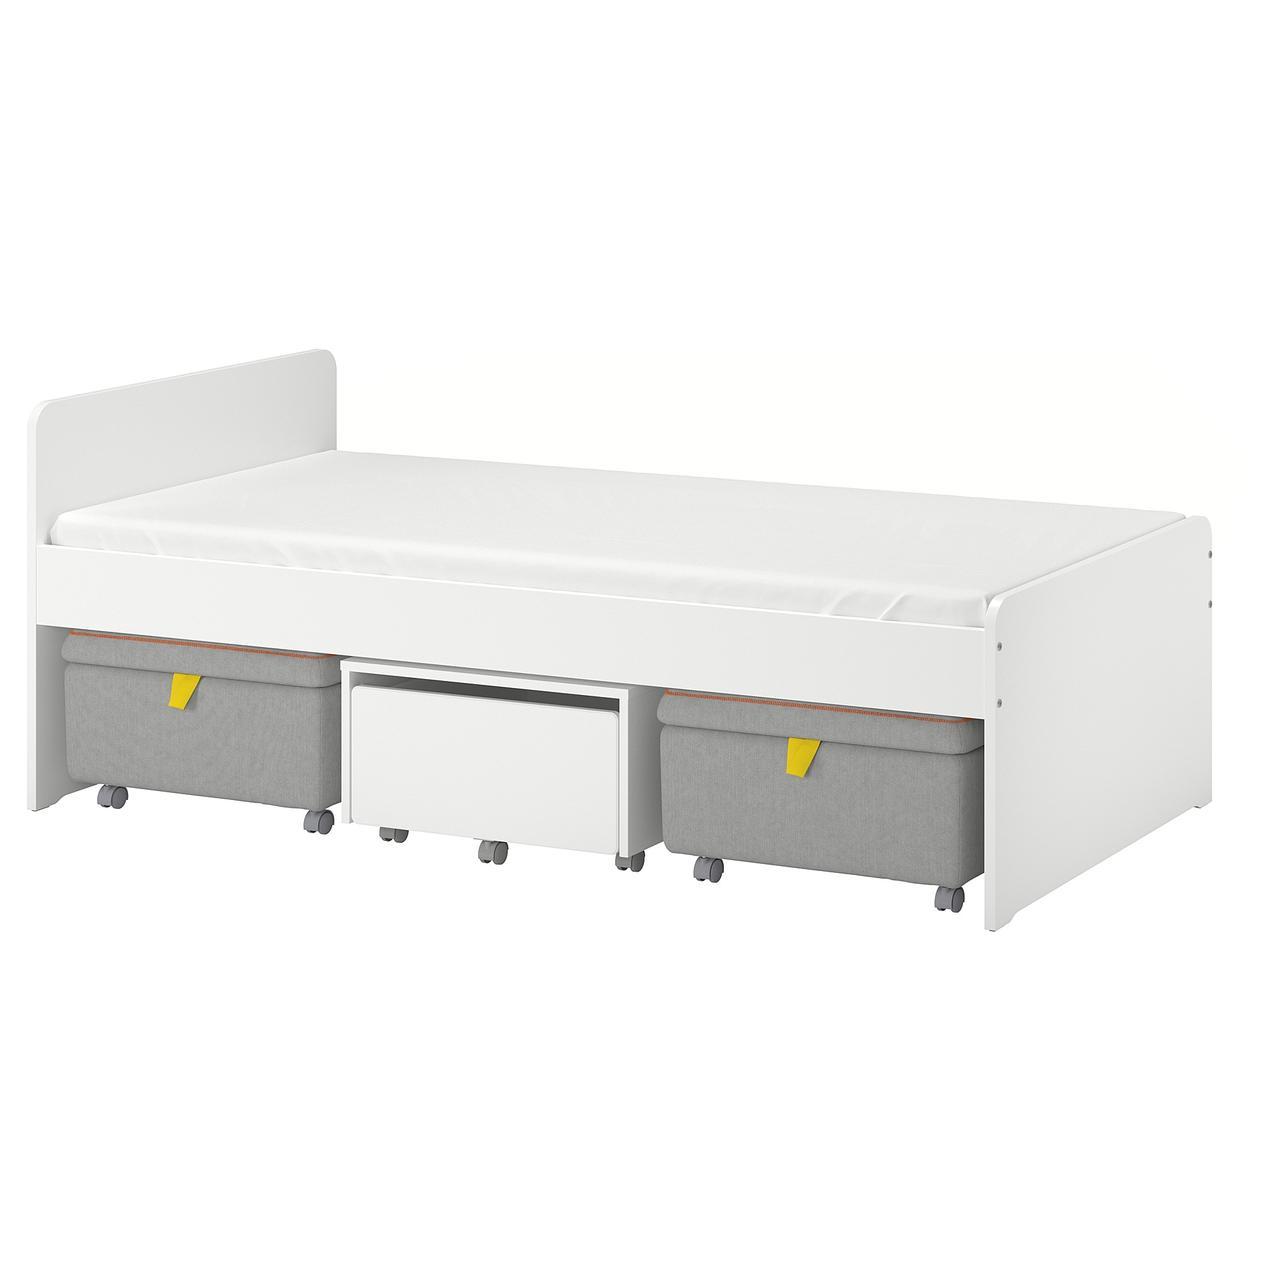 СЛЭКТ Каркас кровати+секции, белый, серый